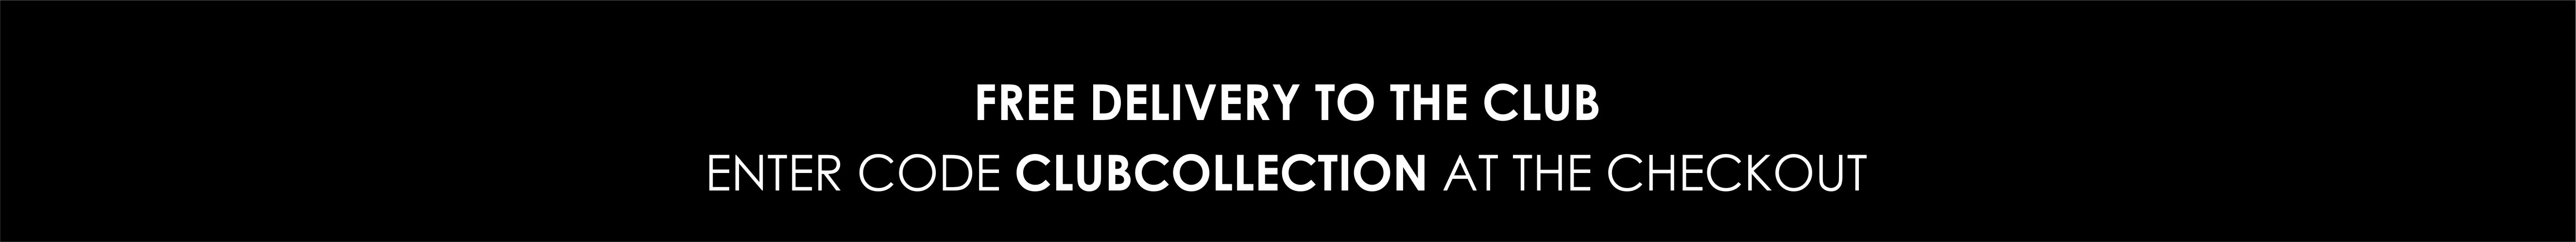 veseyans-club-collection-banner.jpg